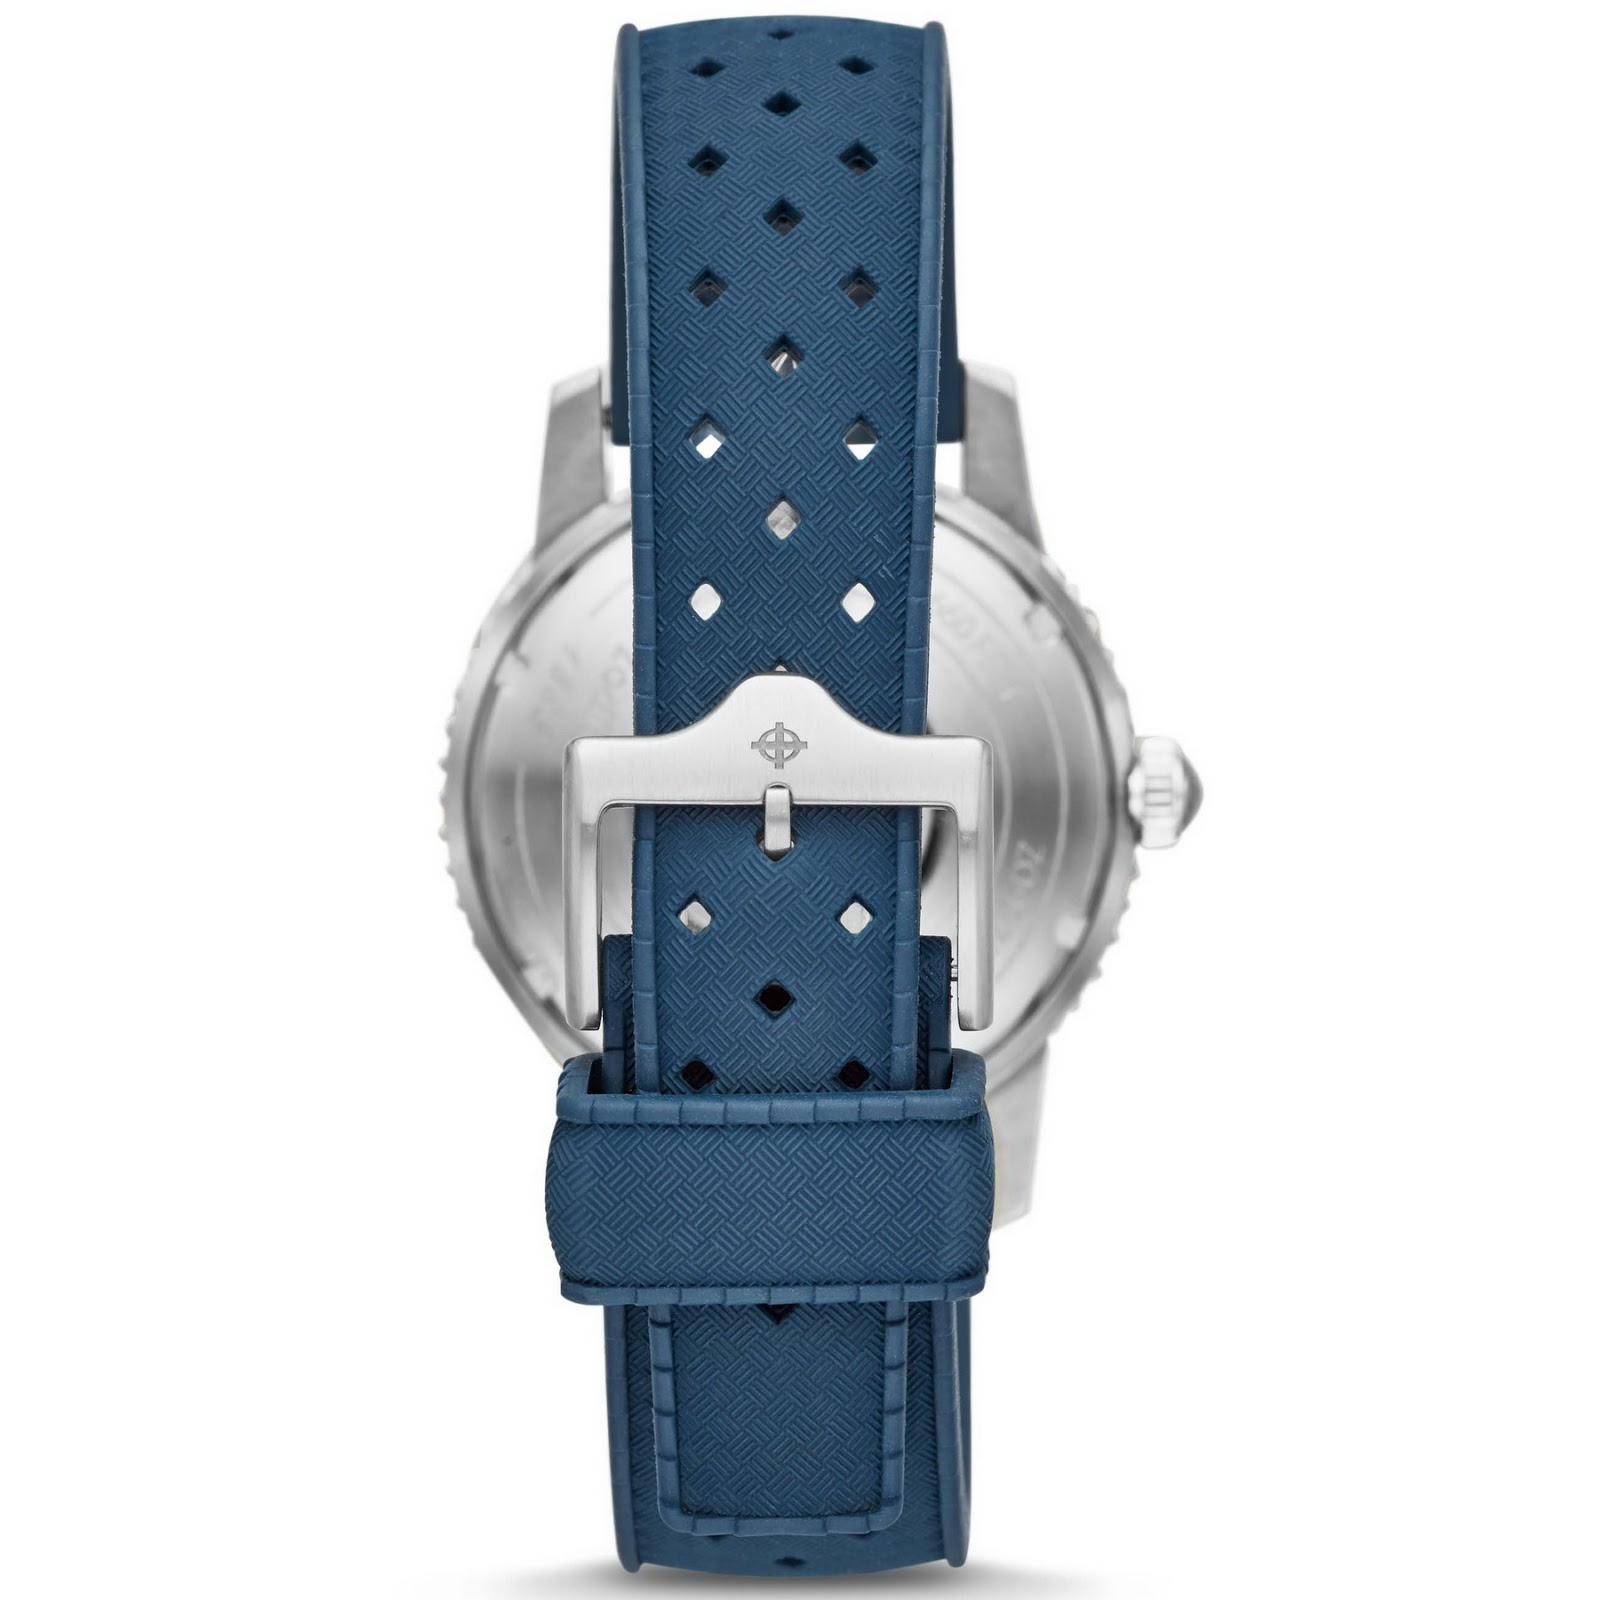 Zodiac's new Super Sea Wolf on Blue Rubber + Two -Tone Zodiac%2BSUPER%2BSEA%2BWOLF%2B11